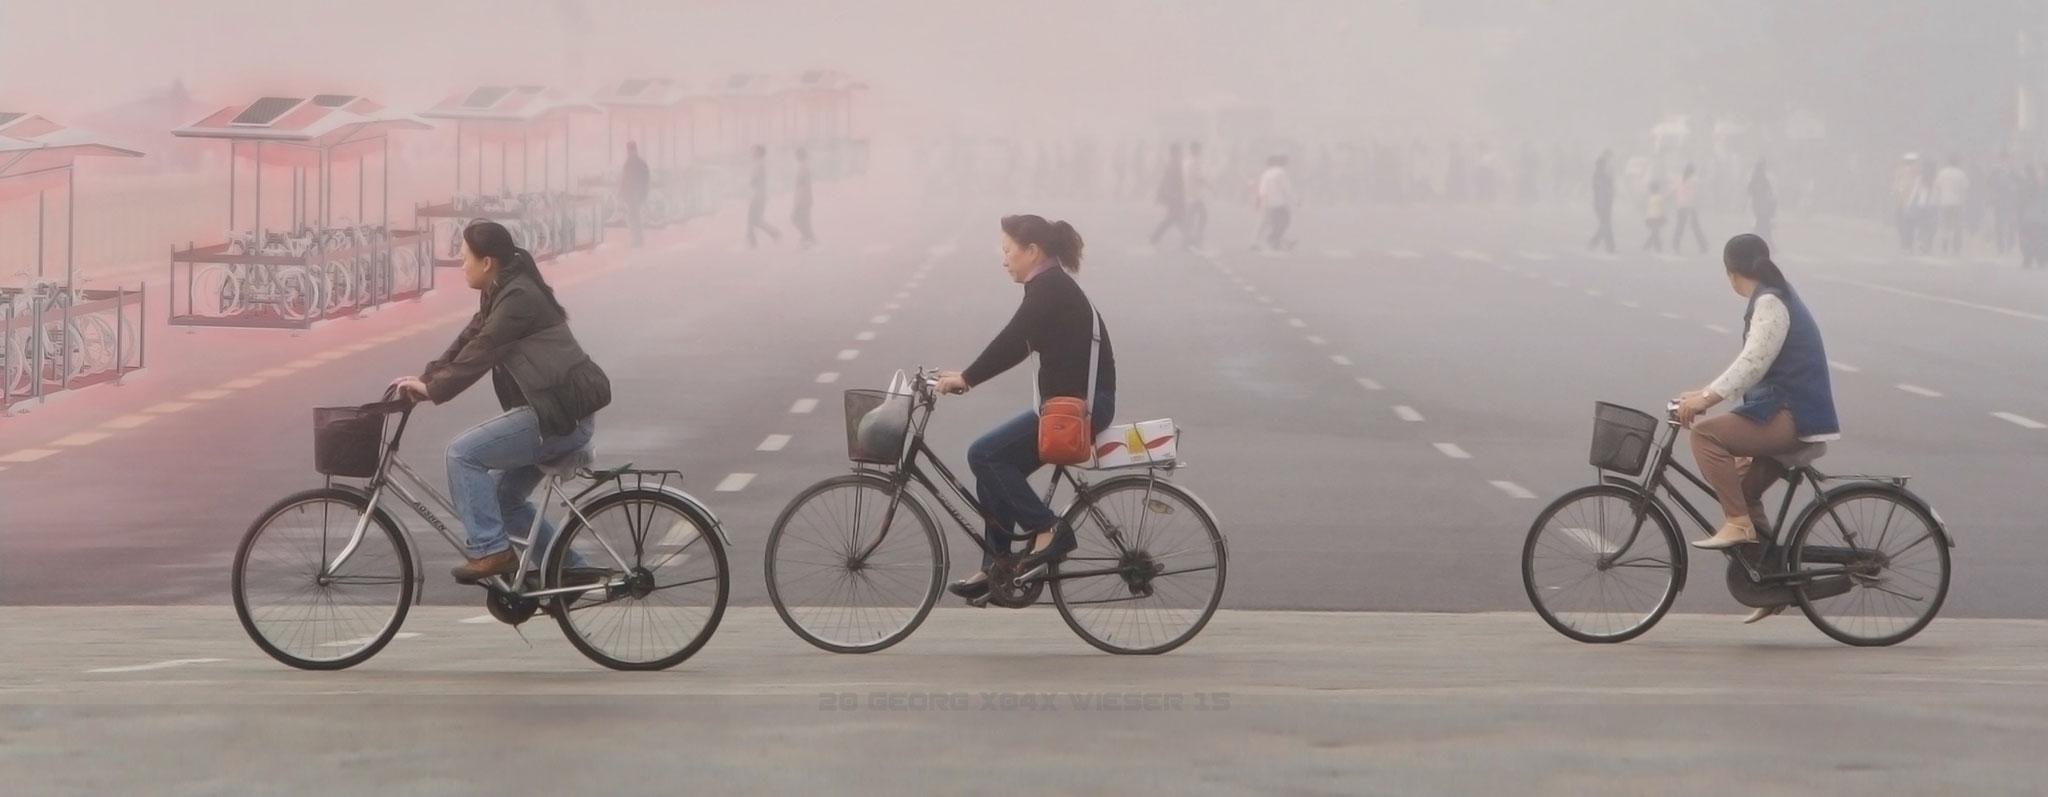 BANNER_Smarter-Than-Car_2015_VIP_Parking_Beijing_xorx4